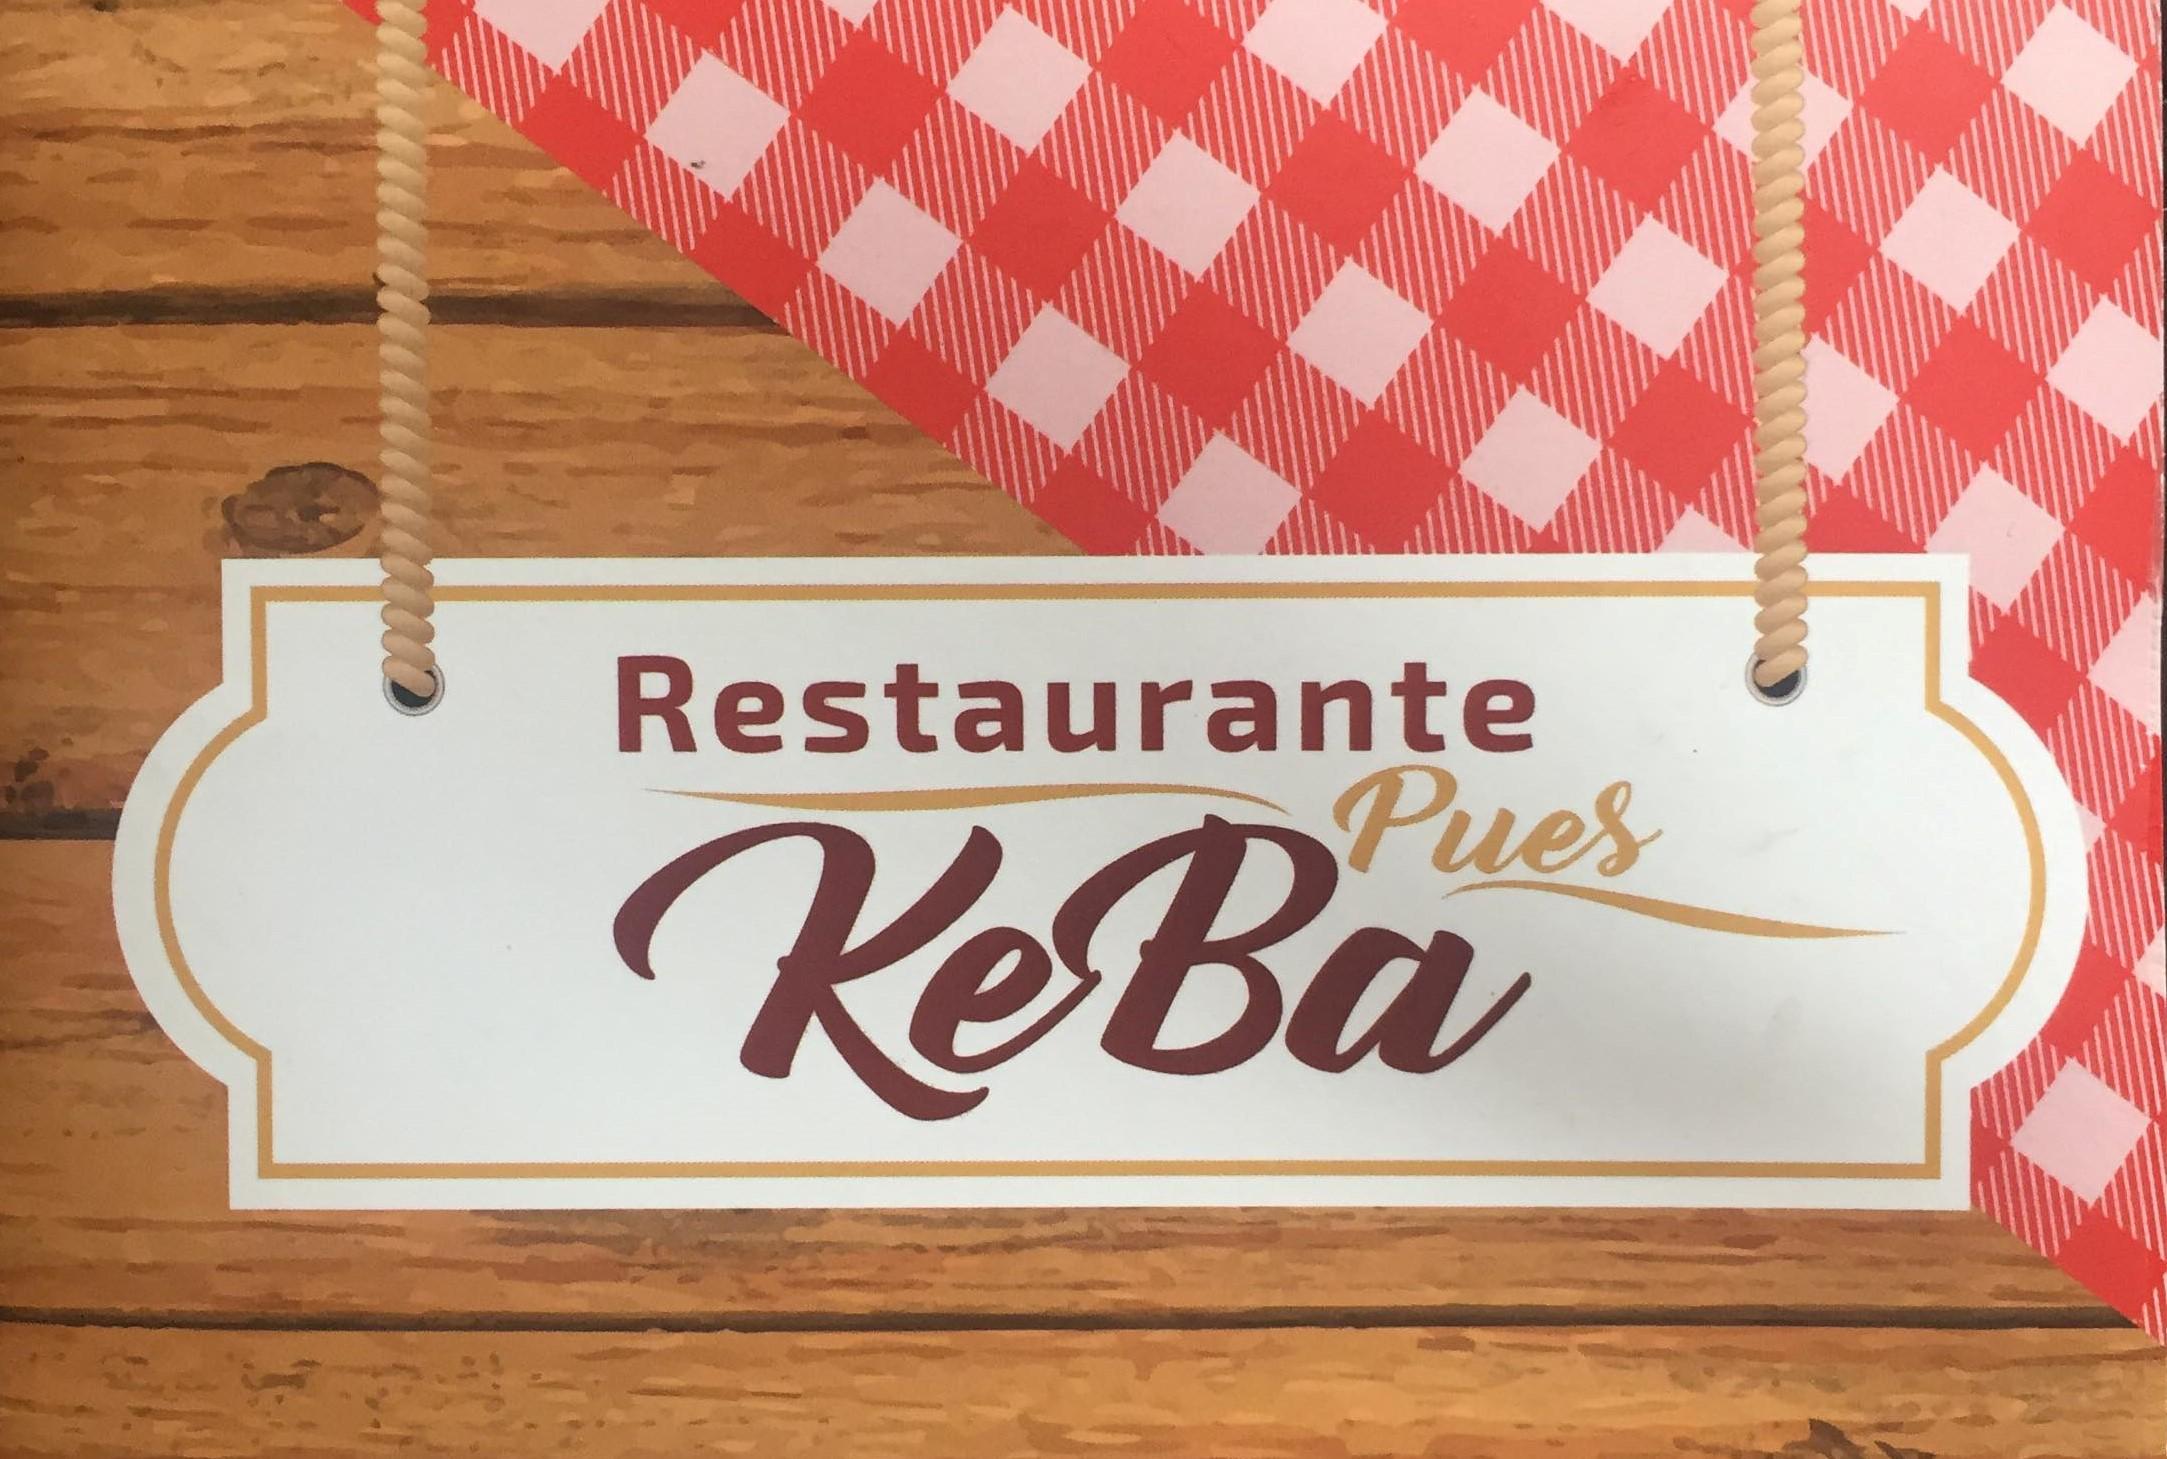 Restaurante Keba Pues